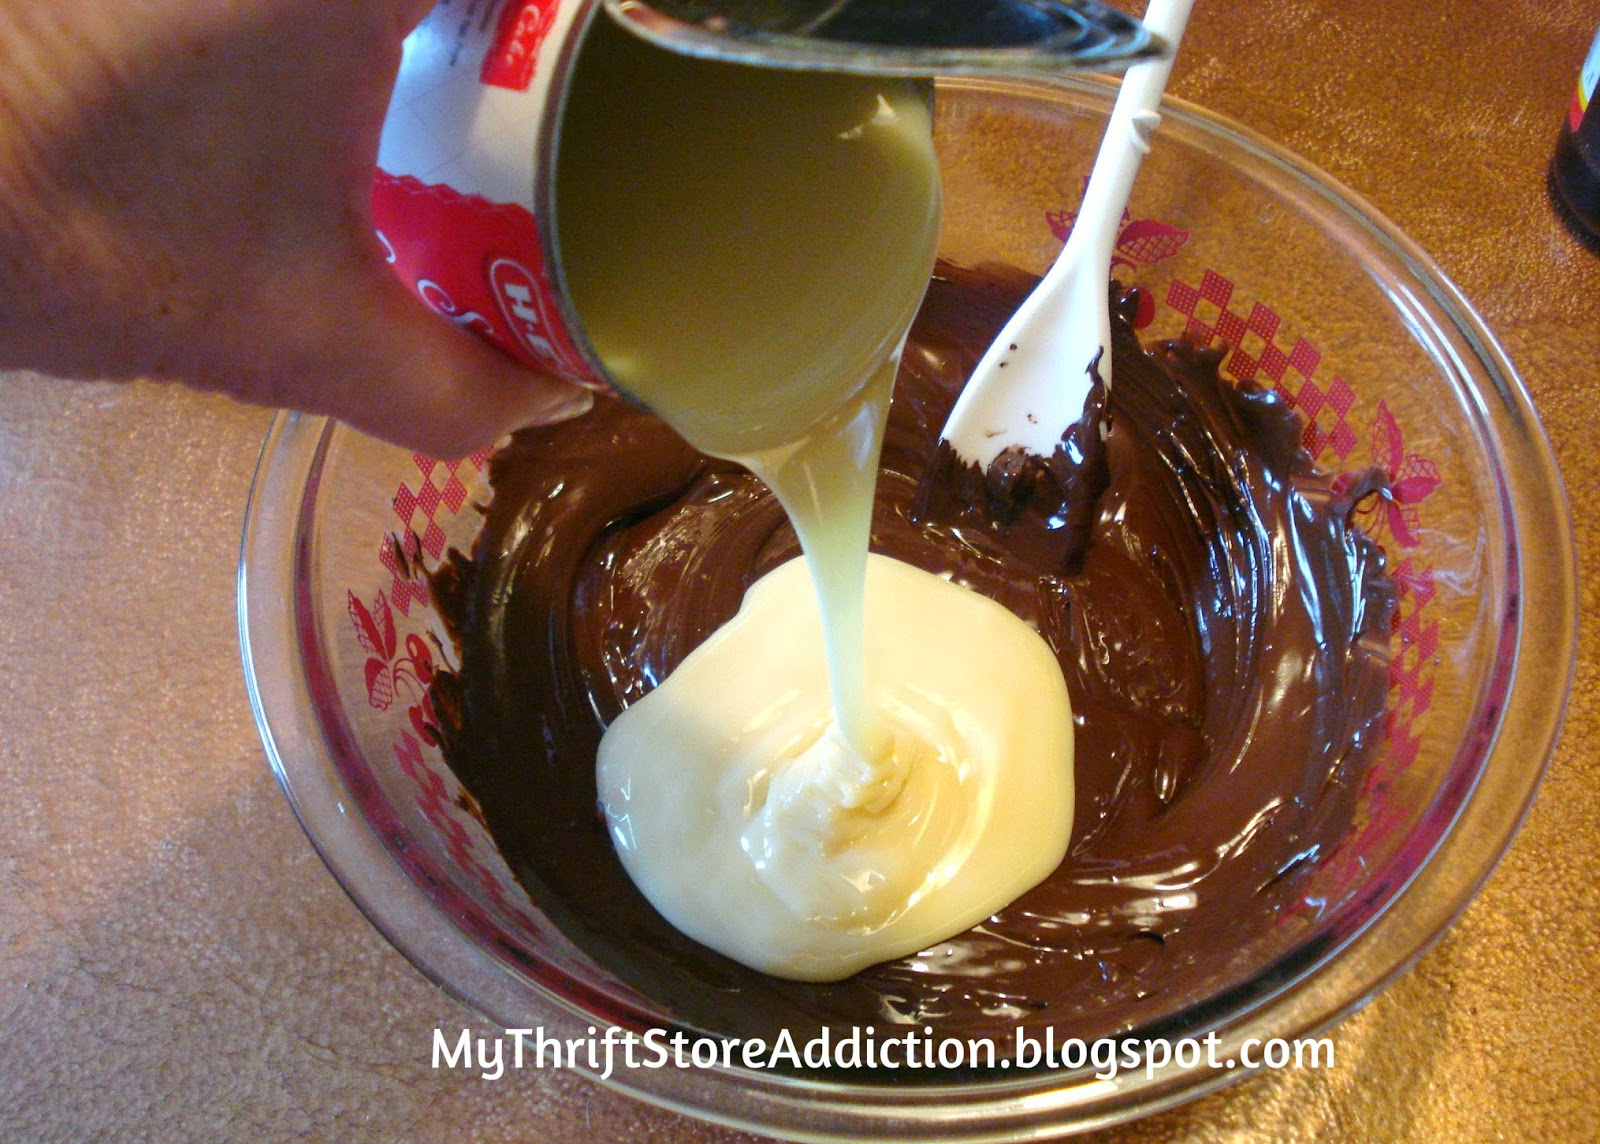 Fudge truffle recipe